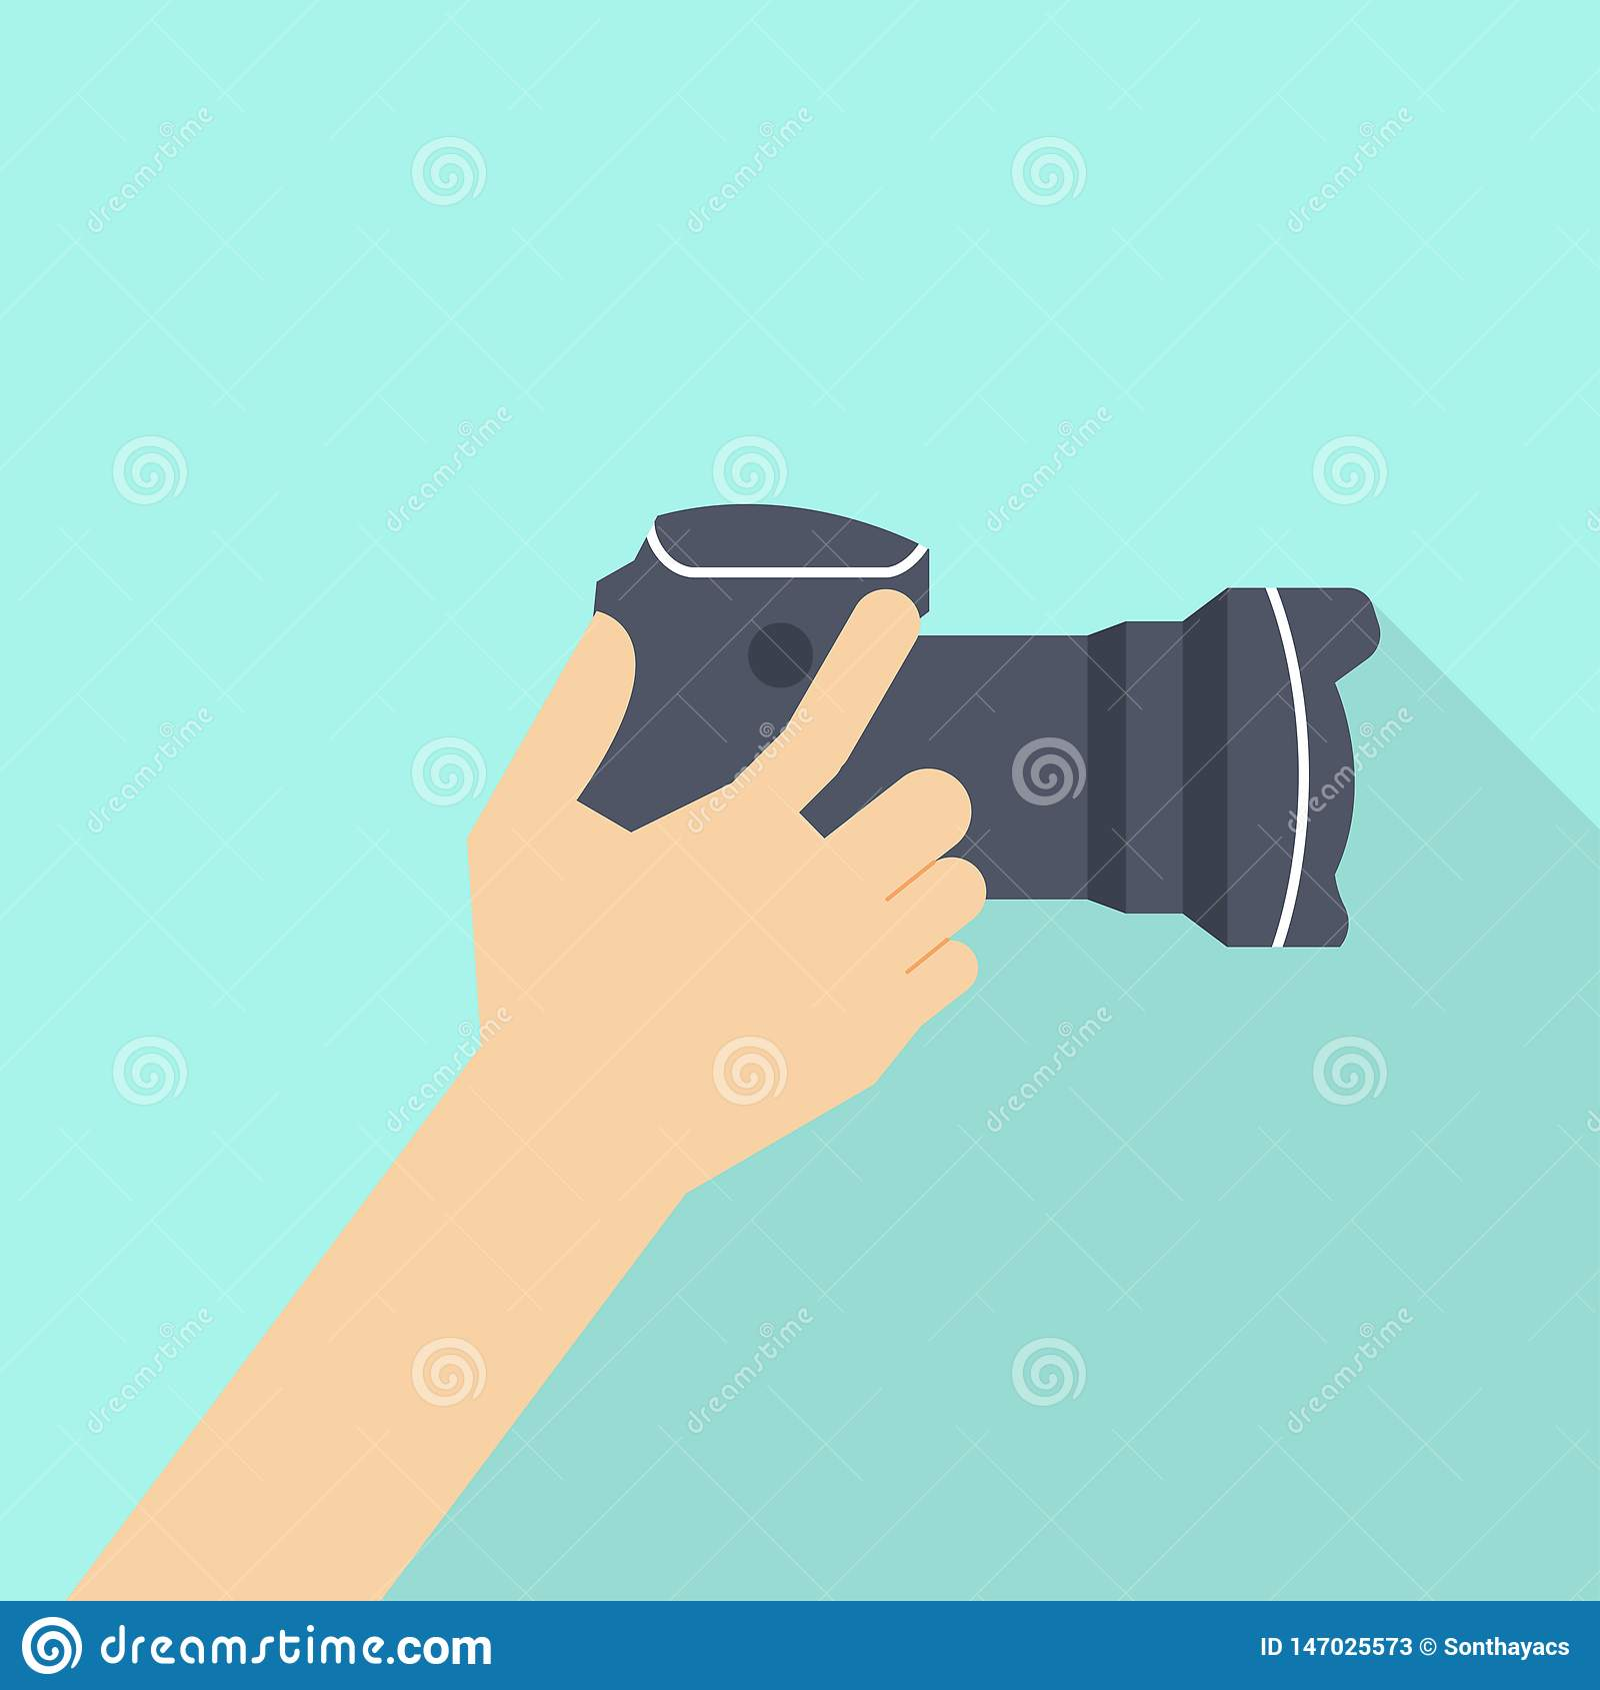 Hand Holding Photo Camera